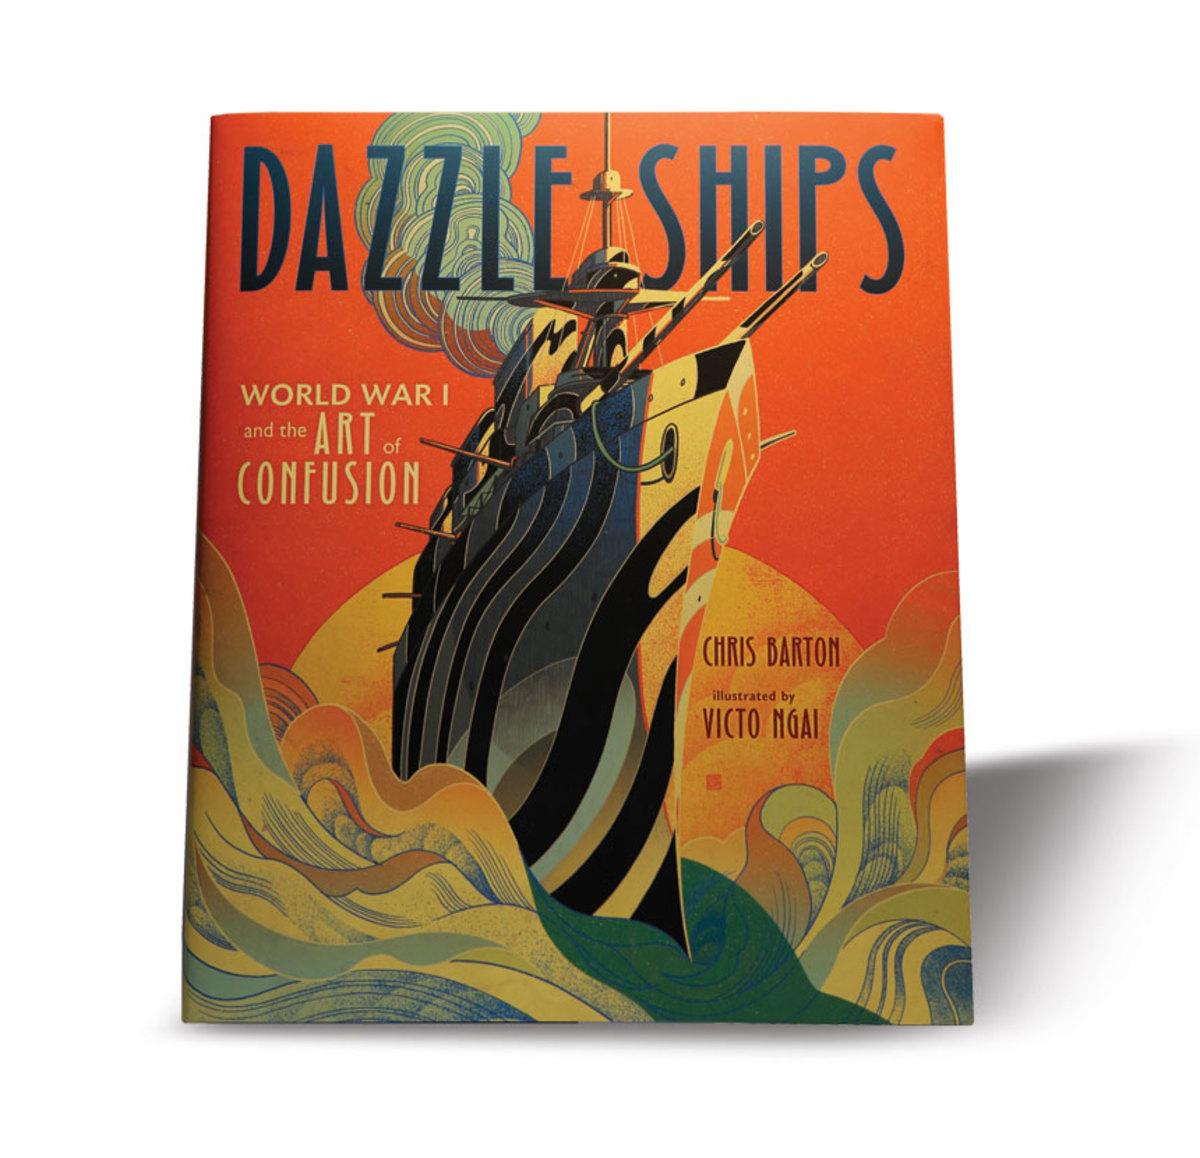 dazzle-ships-book-cover